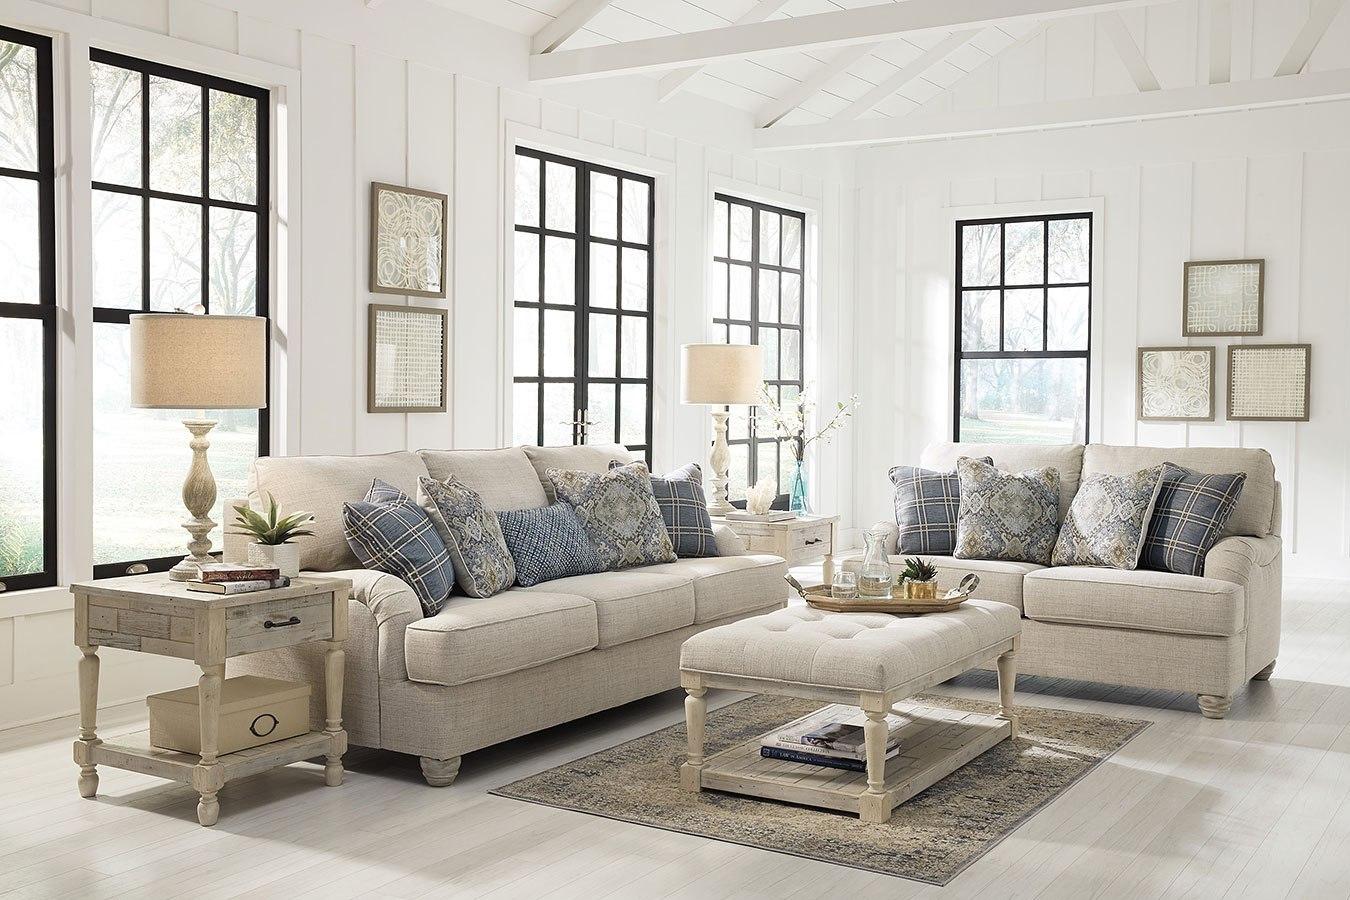 Traemore linen living room set by benchcraft furniturepick